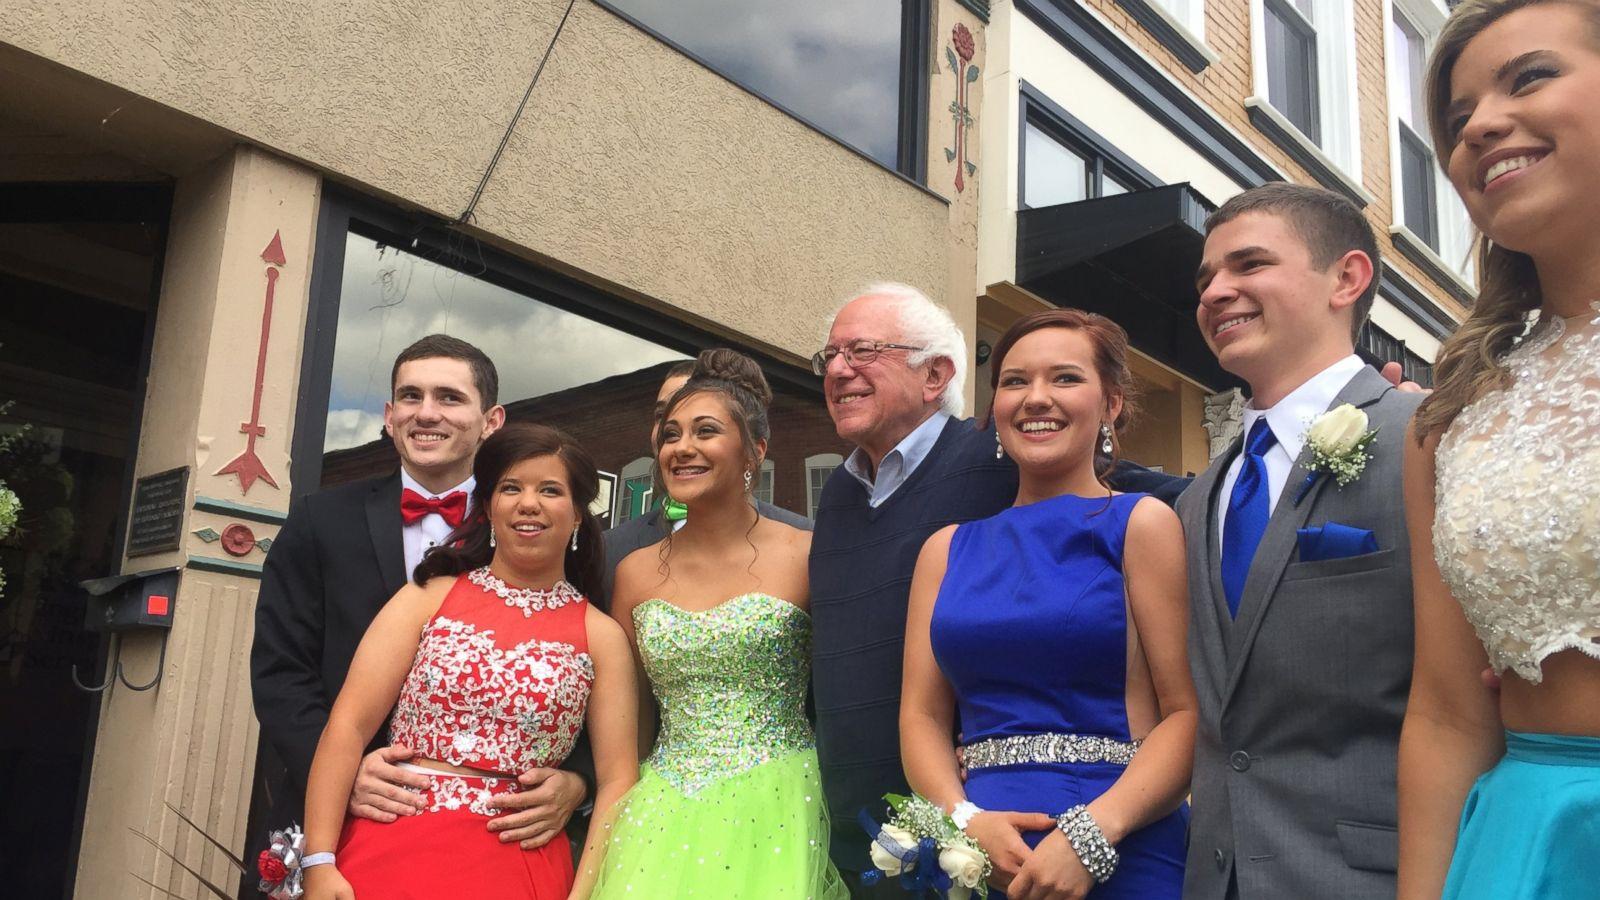 Bernie Sanders Greets Students Headed to Prom - ABC News